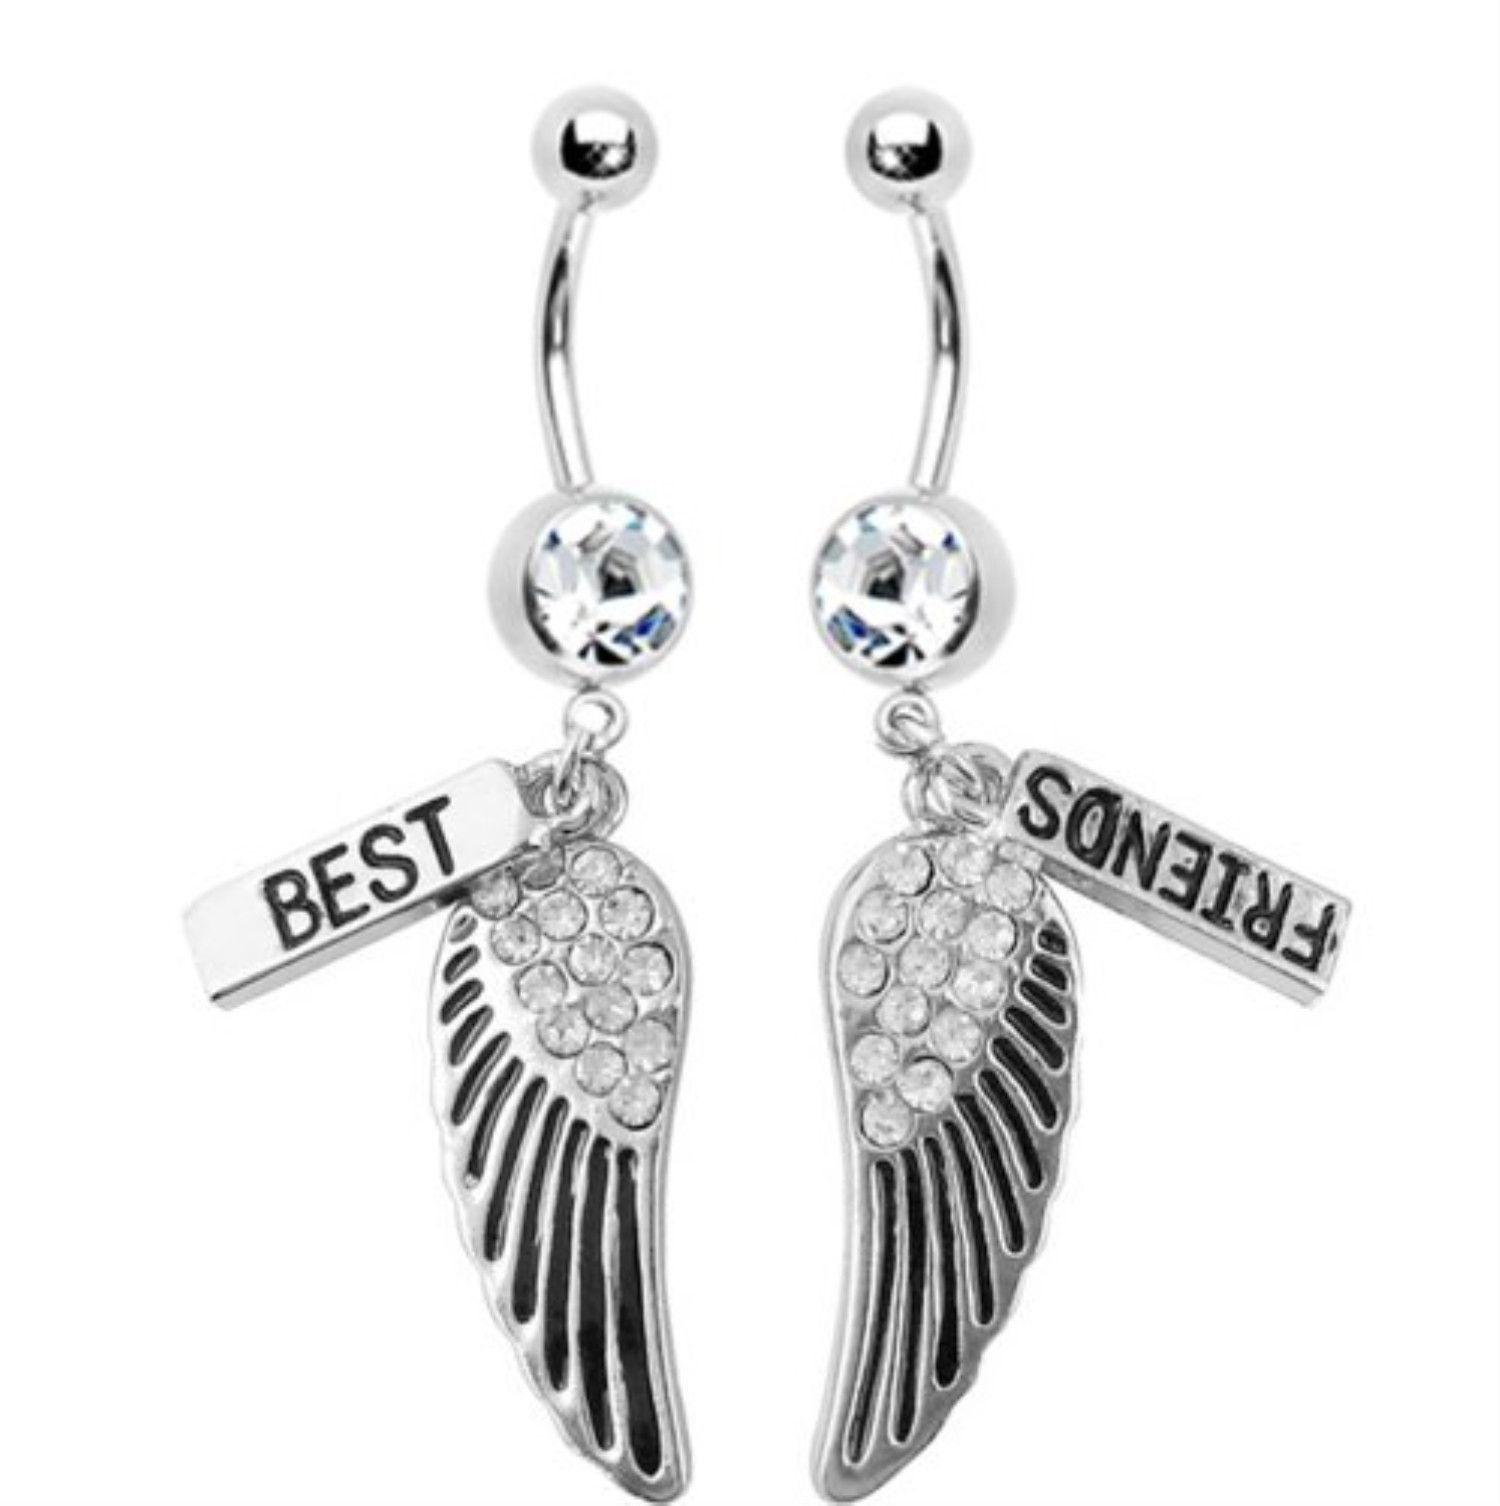 Body piercing retainer  BodyJYou Belly Button Rings Best Friends Wings Dangle G Lot of